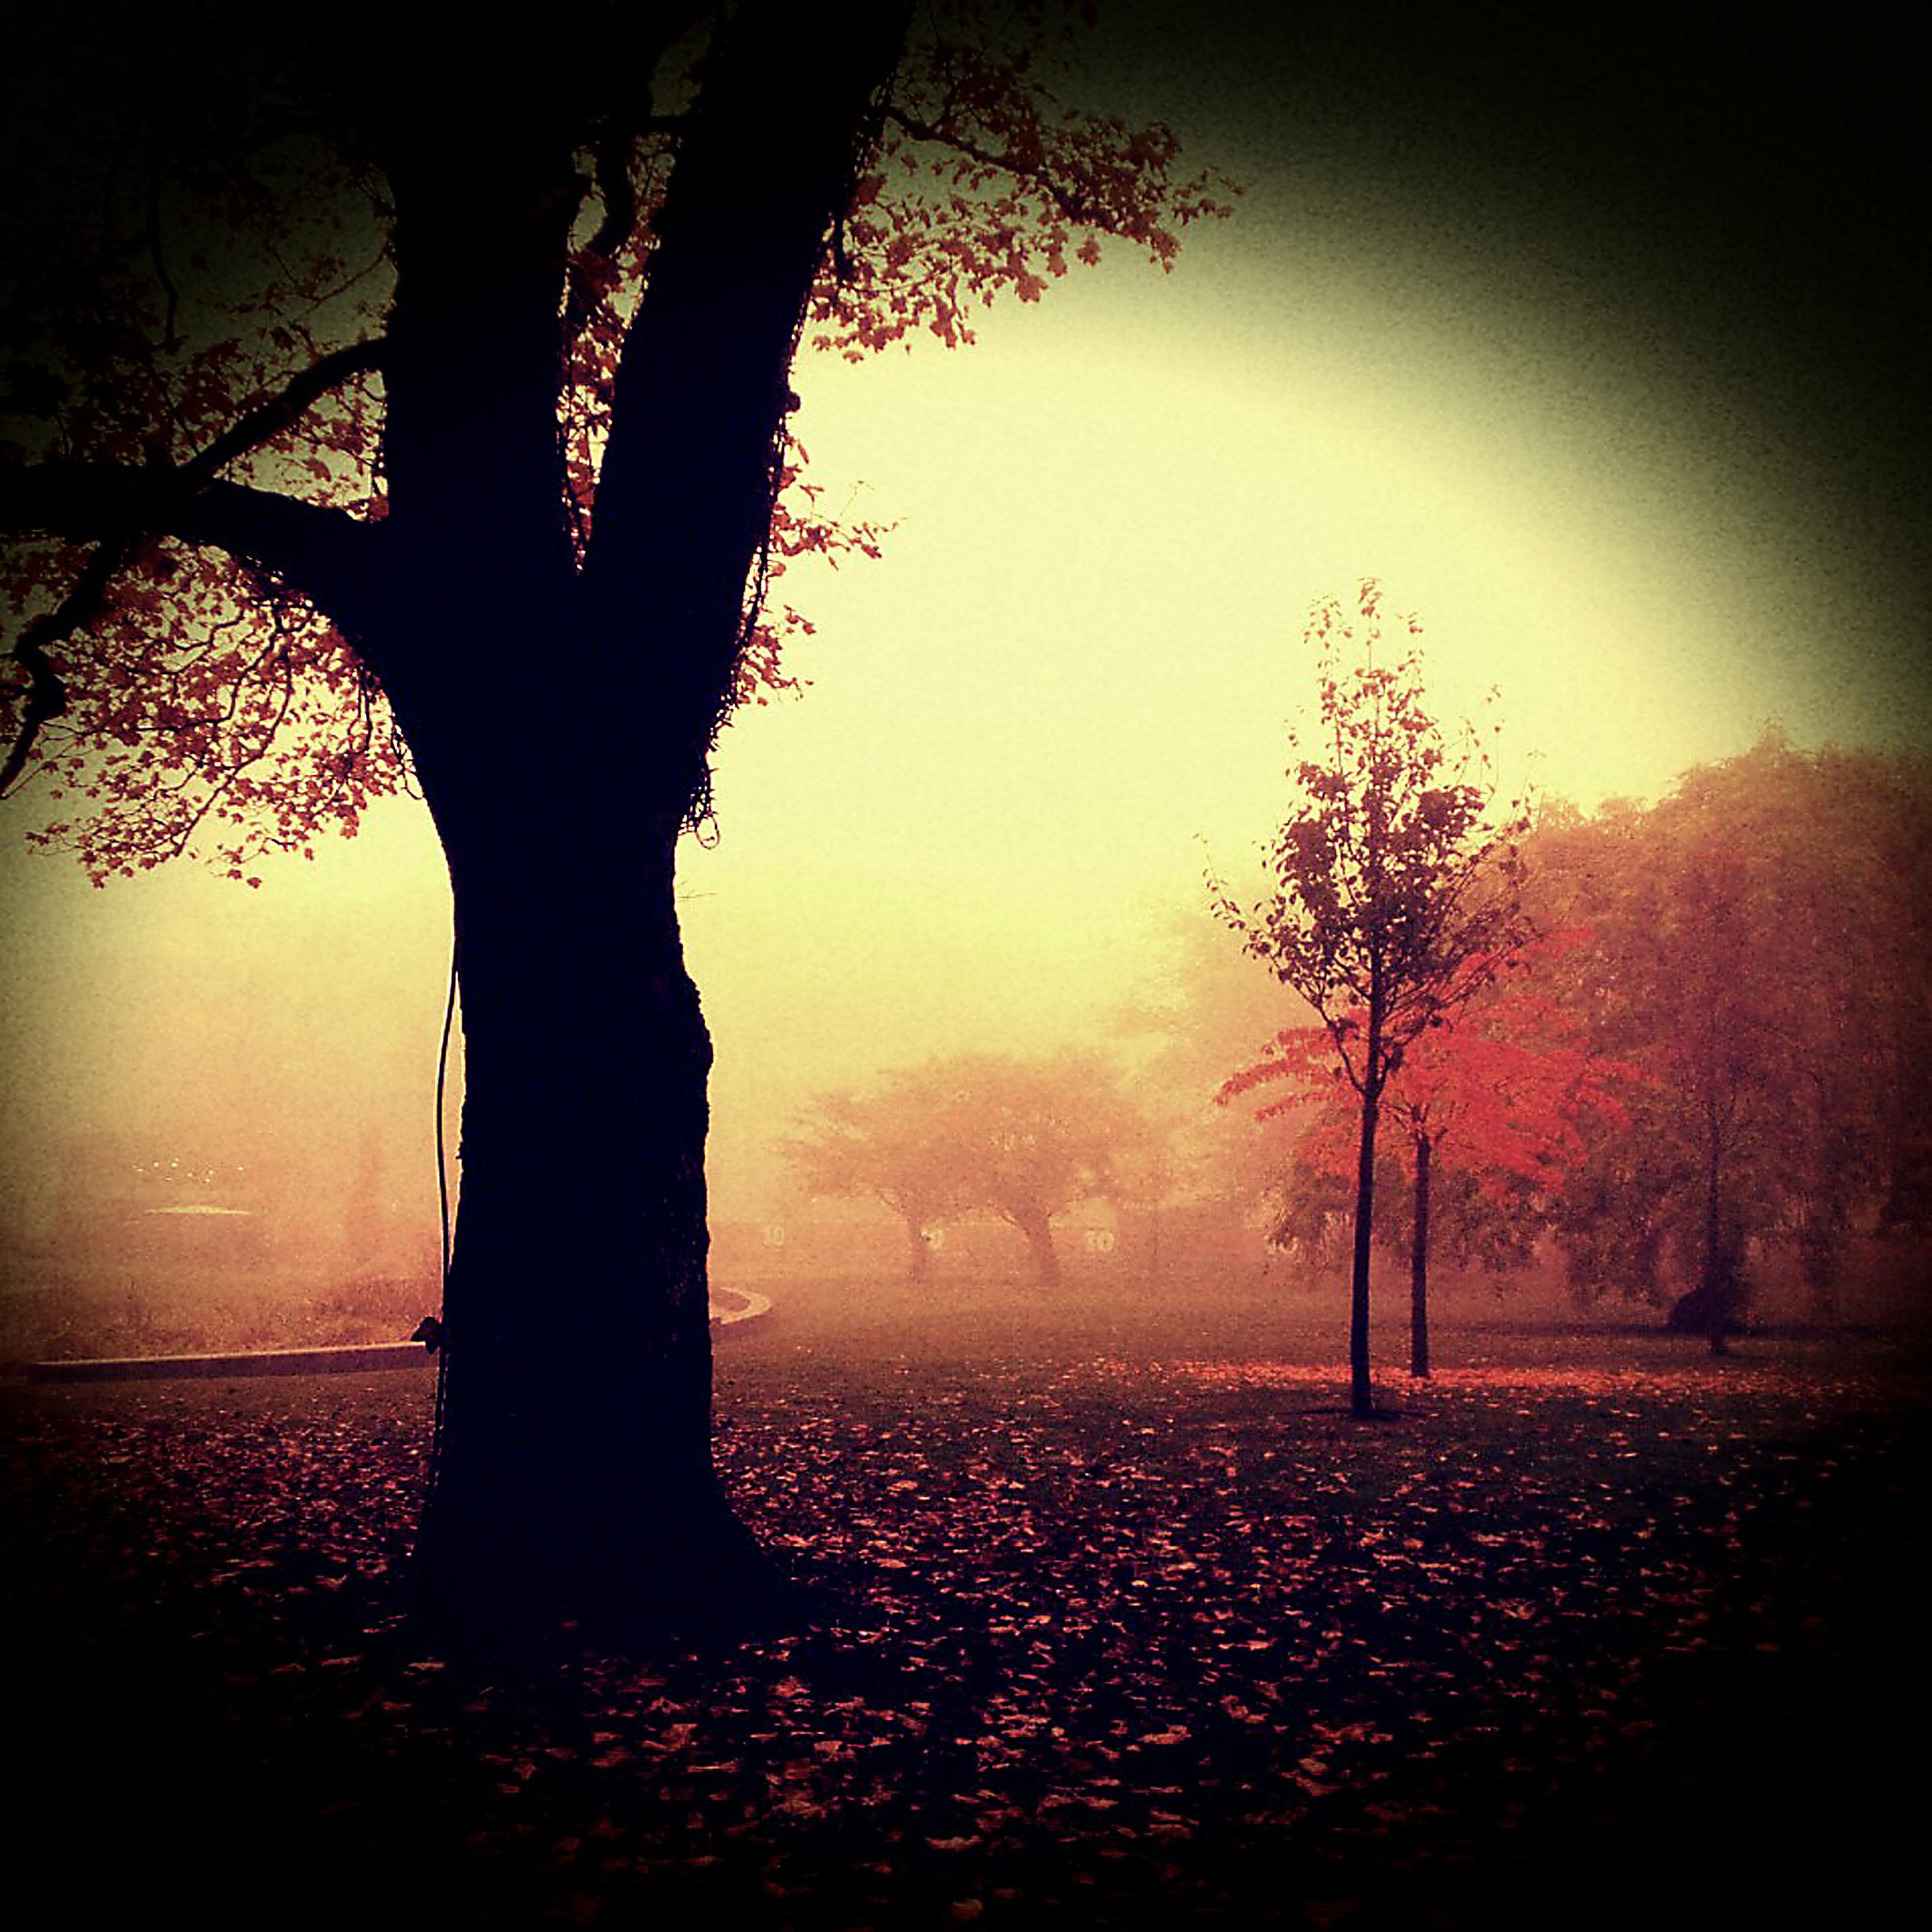 Autumn Melancholy by pvalentega